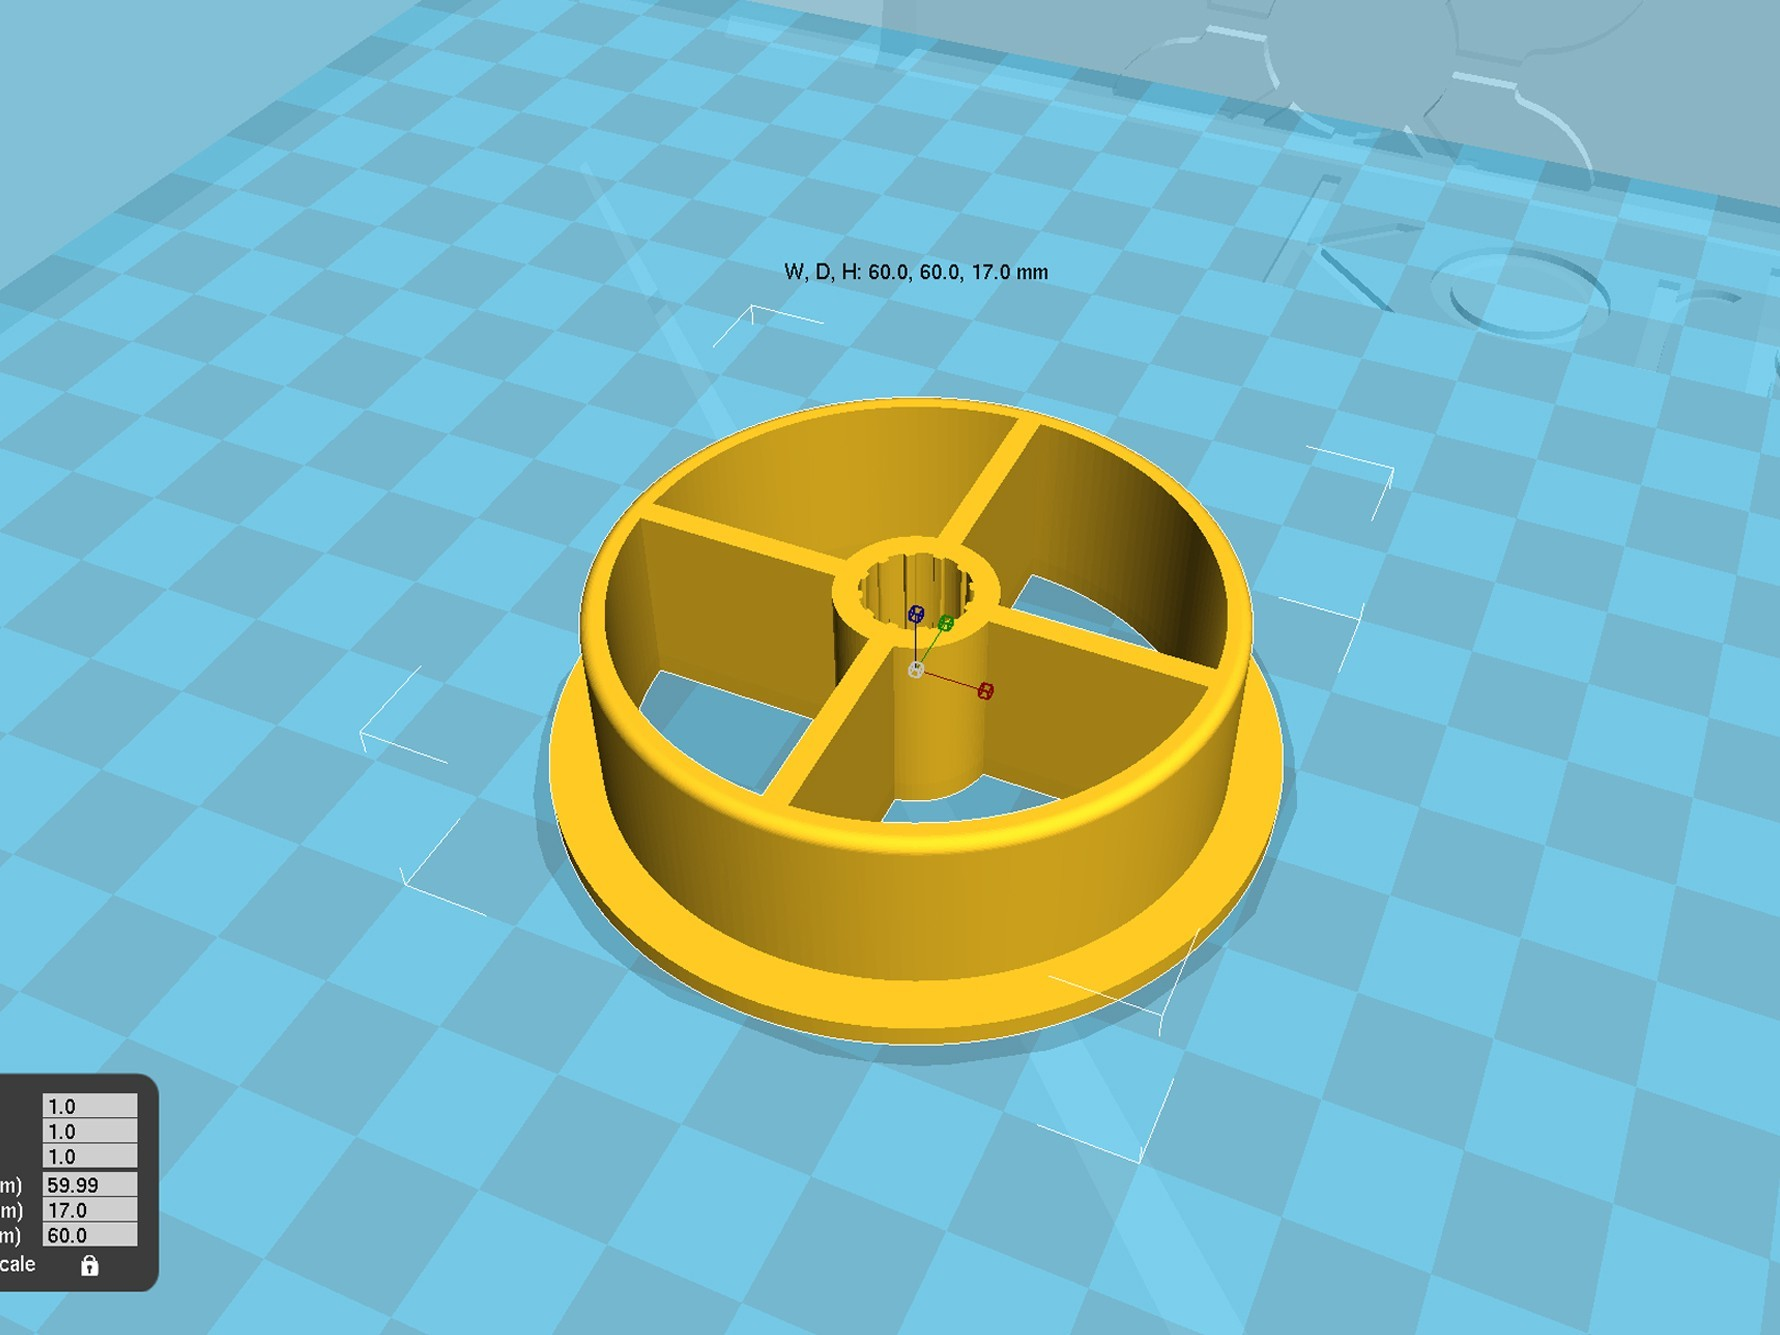 spool_adapter_53_in9.jpg Download free STL file 3d printer filament spool_adapter_53_in9 • 3D printing model, 3D_parts